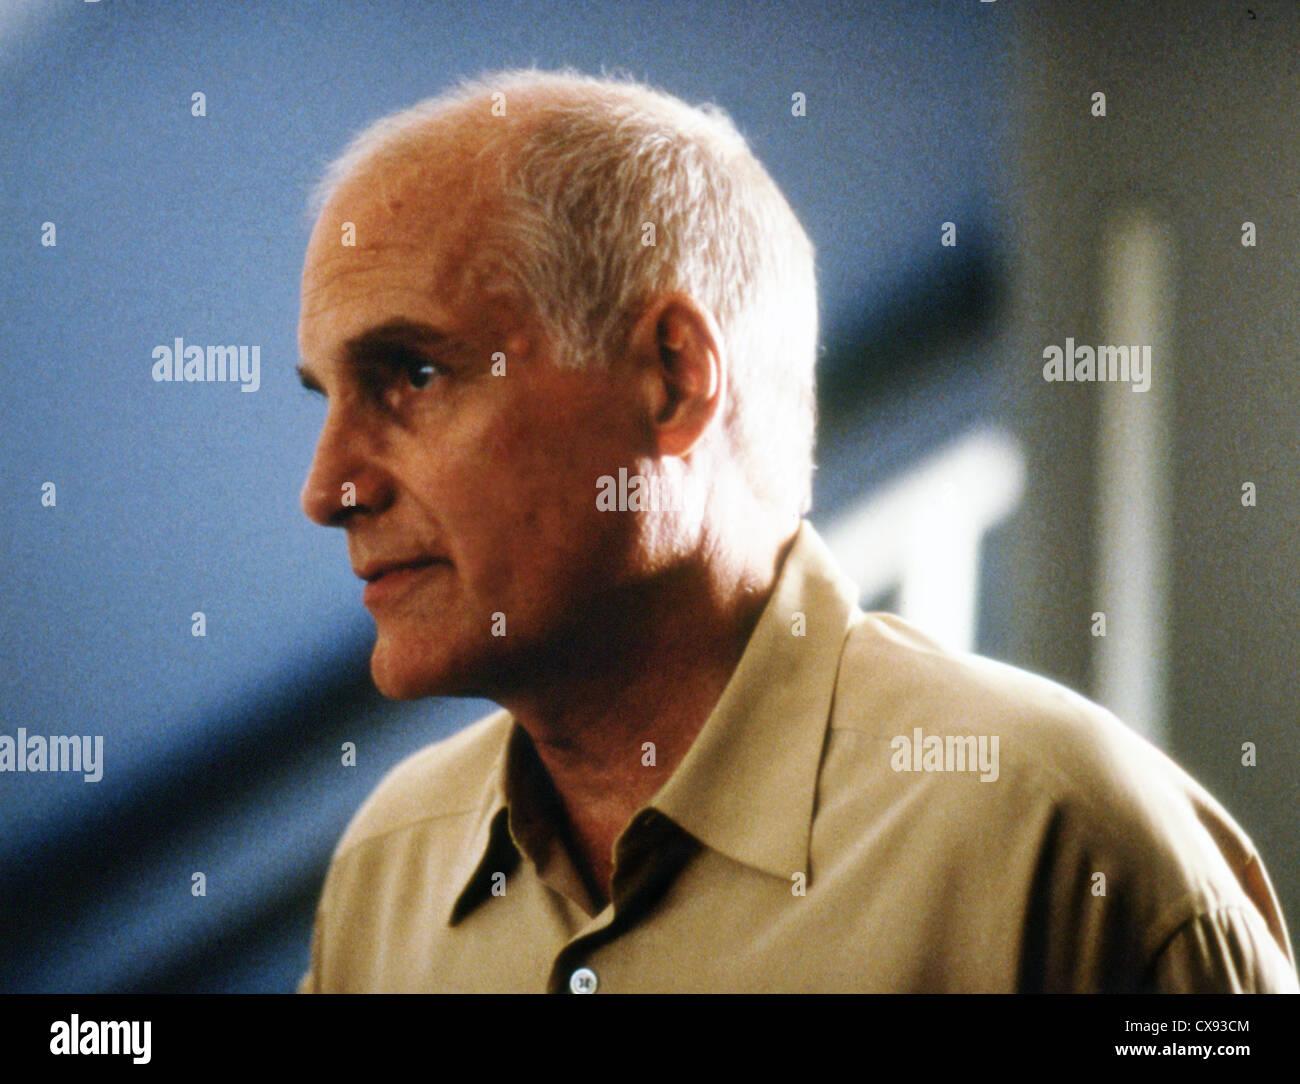 BARBET SCHROEDER (PORTRAIT) 'DESPERATE MEASURES (1997) BRSD 006 MOVIESTORE COLLECTION LTD - Stock Image